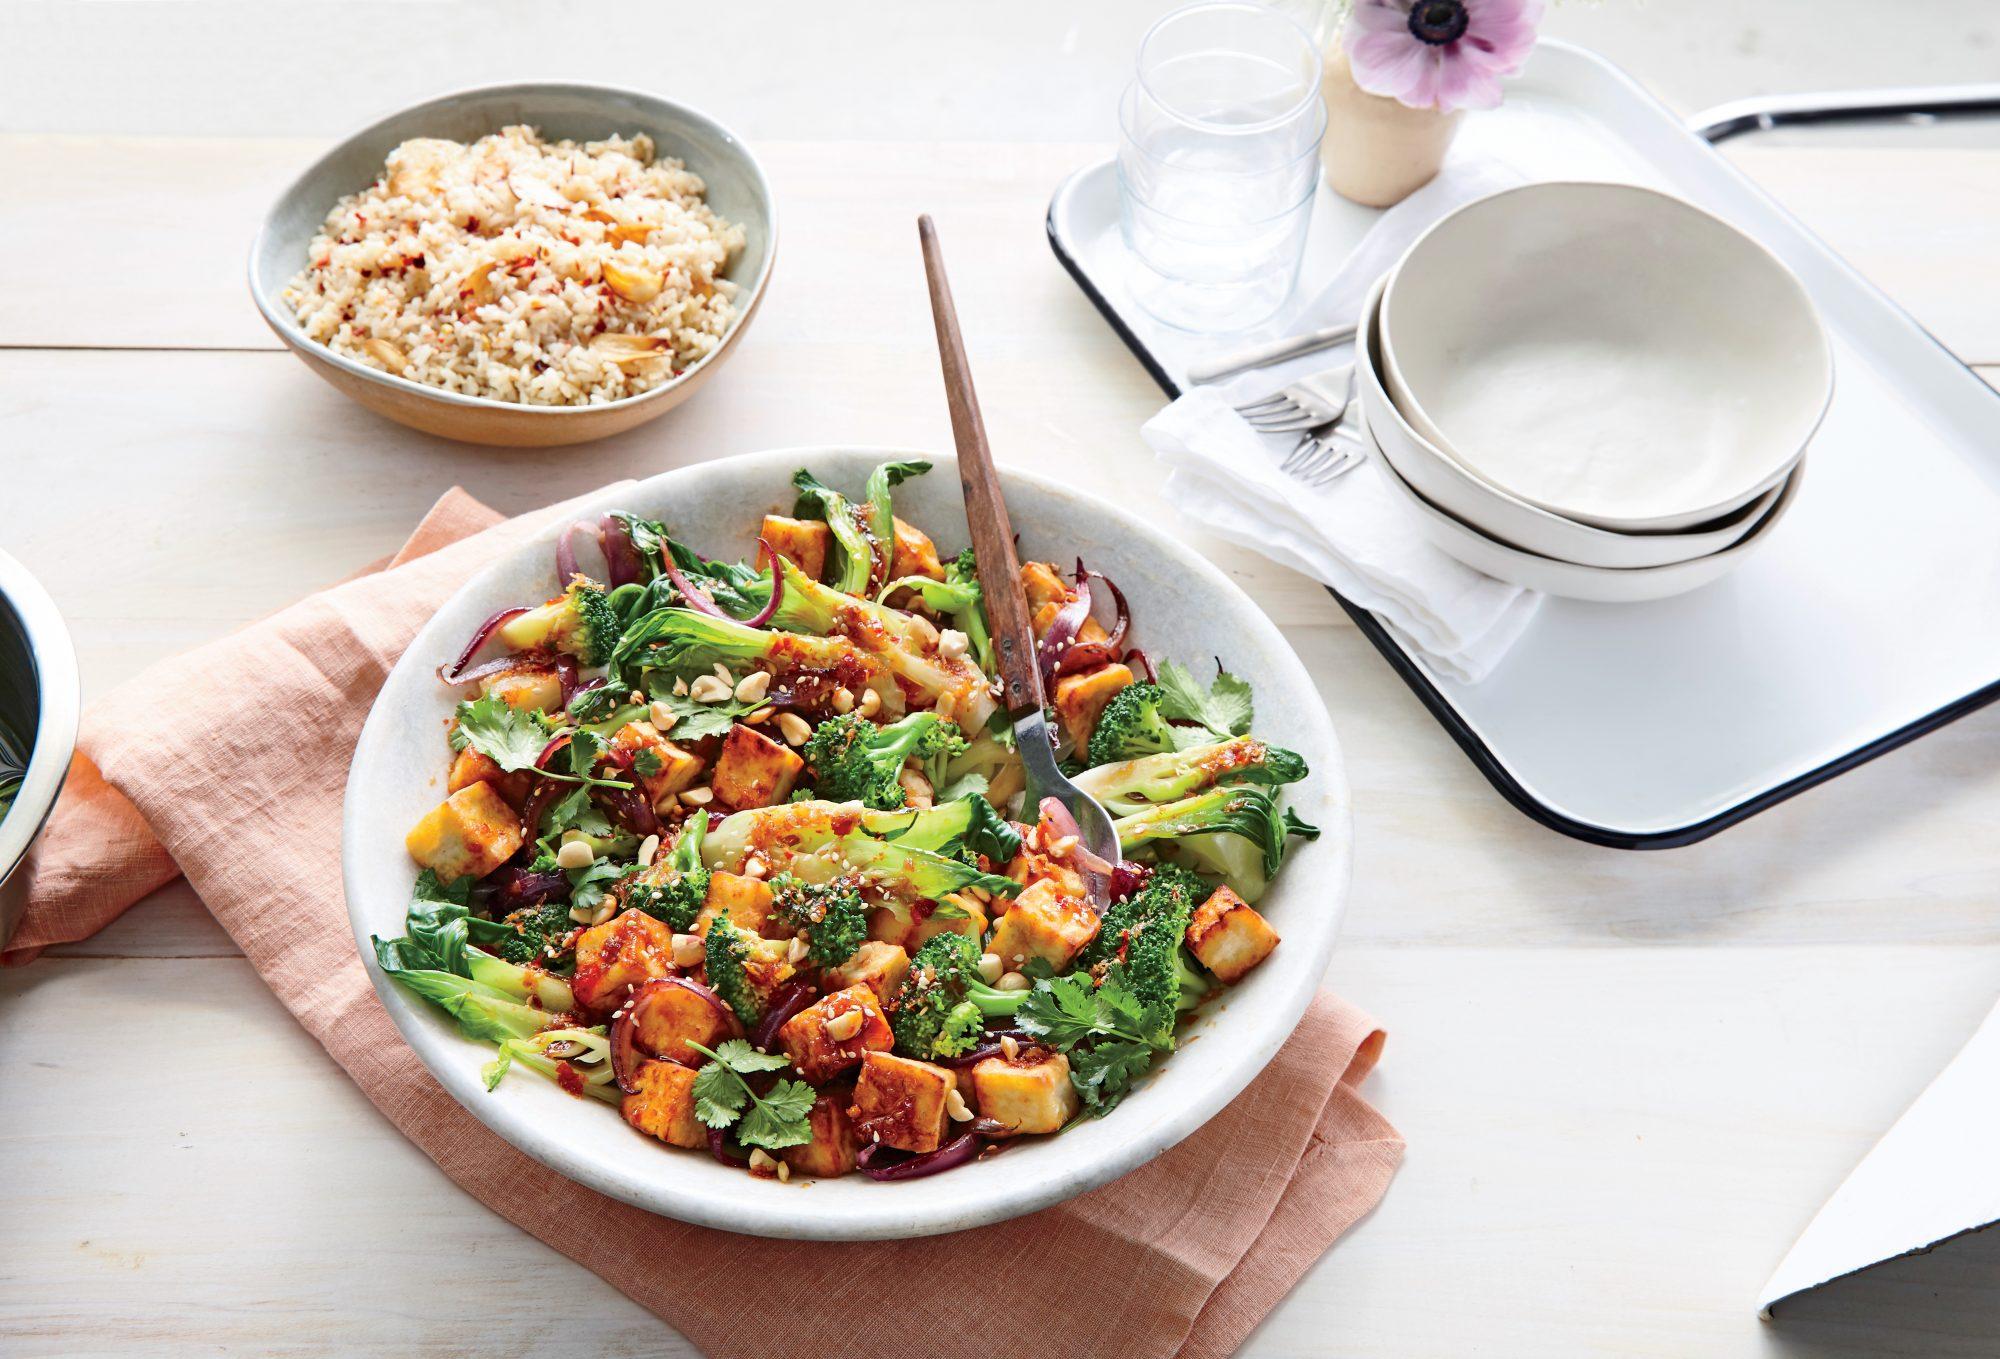 Seared Tofu with Sweet Chili Sauce and Broccoli